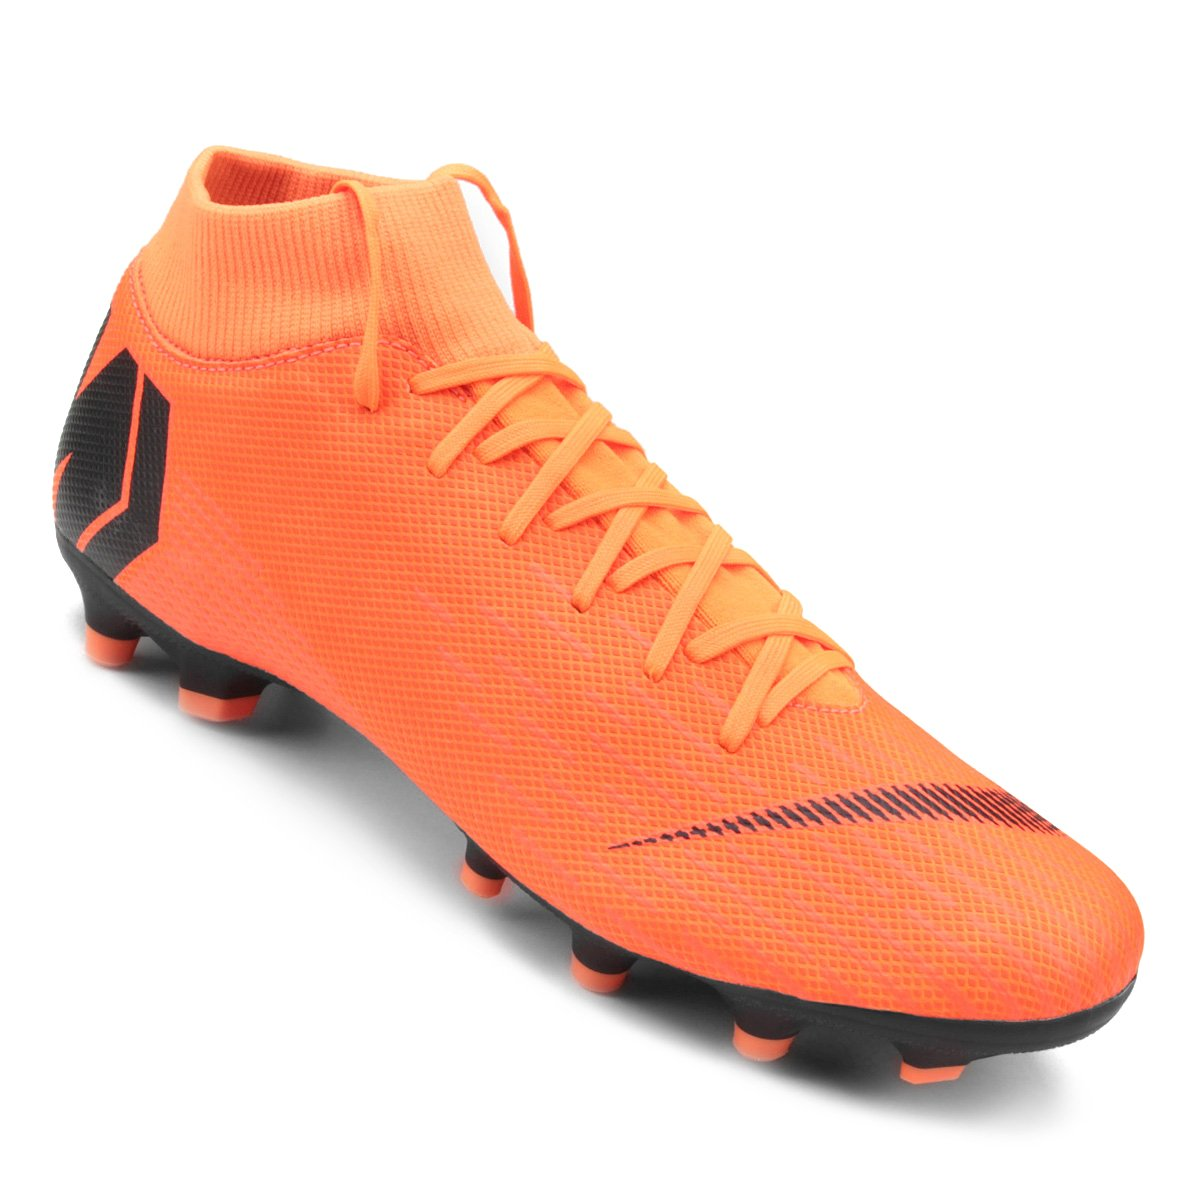 ec03bd9114 48%OFF Chuteira Campo Nike Mercurial Superfly 6 Academy